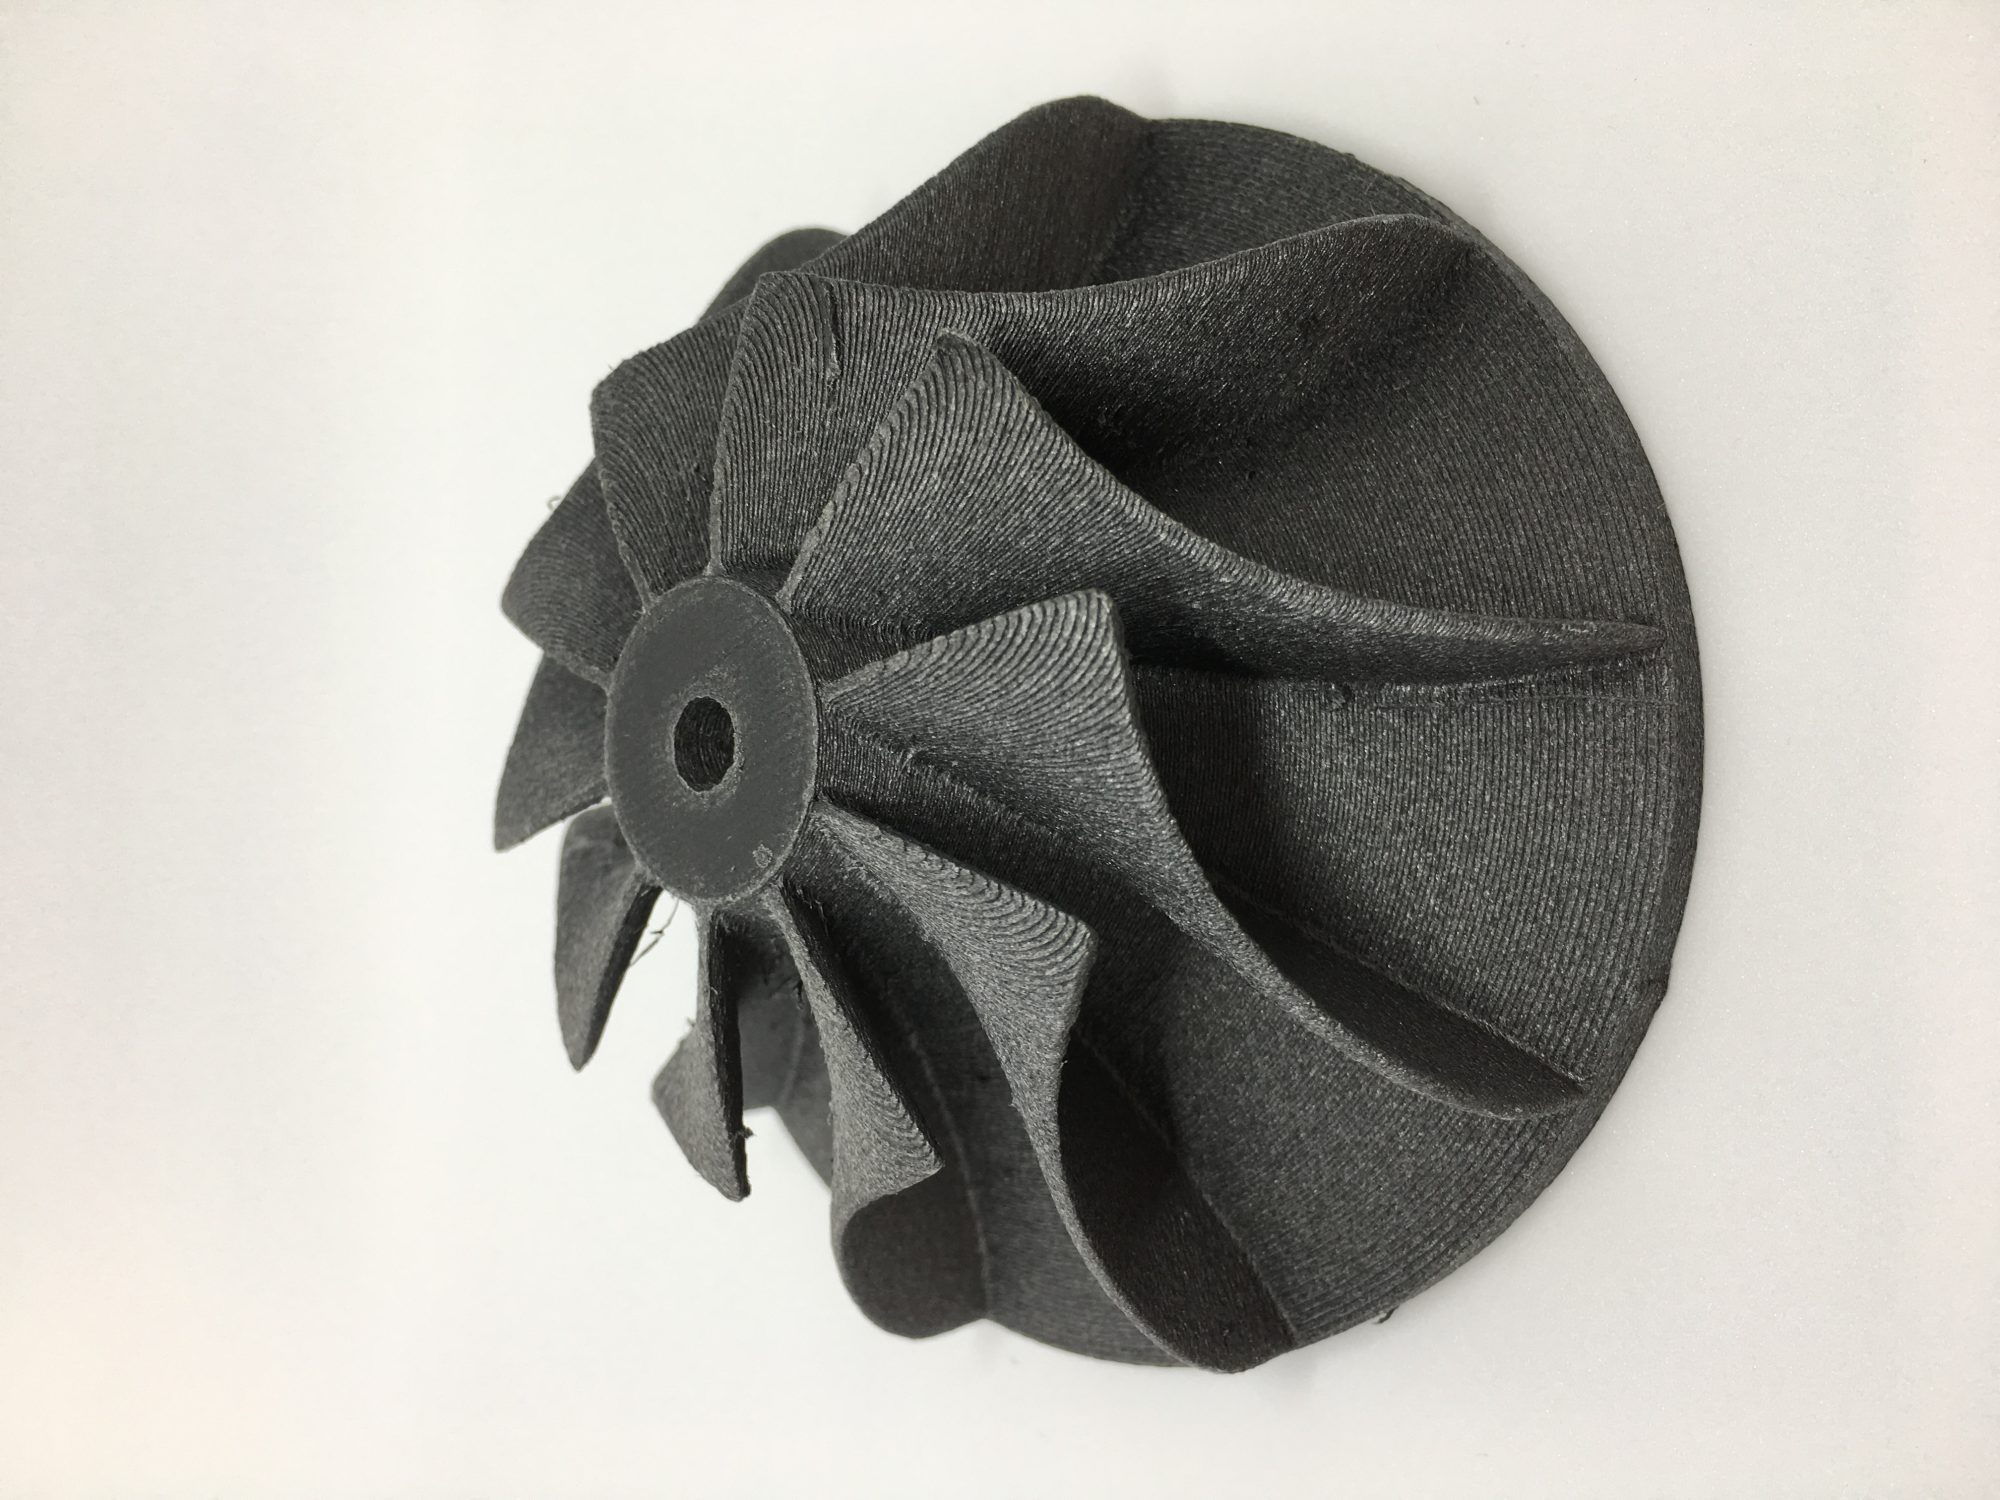 3D Printing With Carbon Fiber Filament